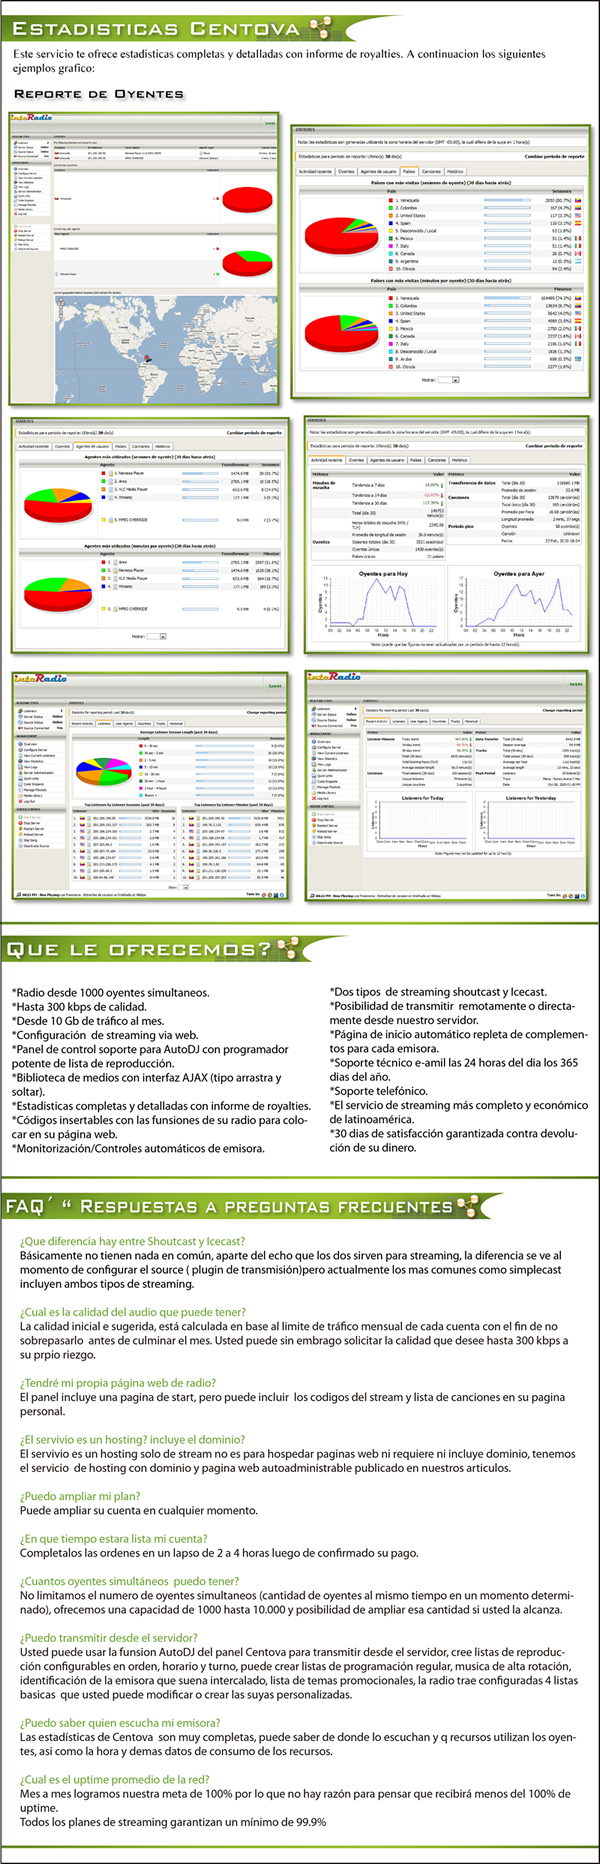 http://intervenhosting.net/mercadolibre/centova2-600.png